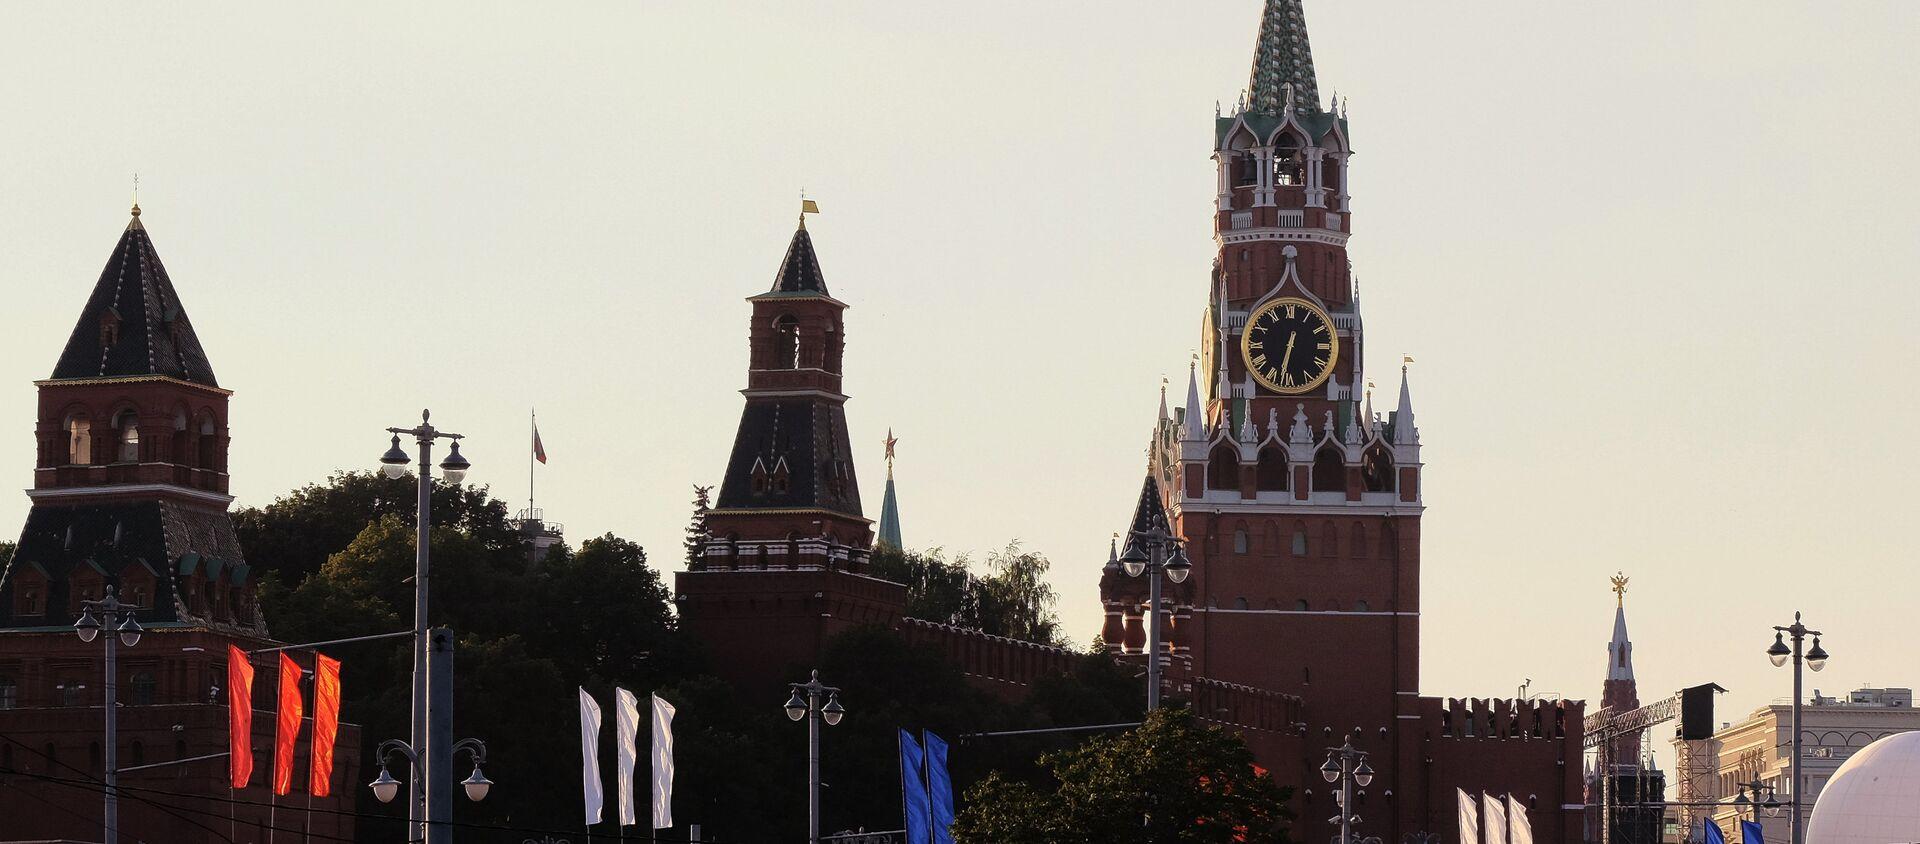 The Moscow Kremlin towers. (File) - Sputnik International, 1920, 17.05.2017